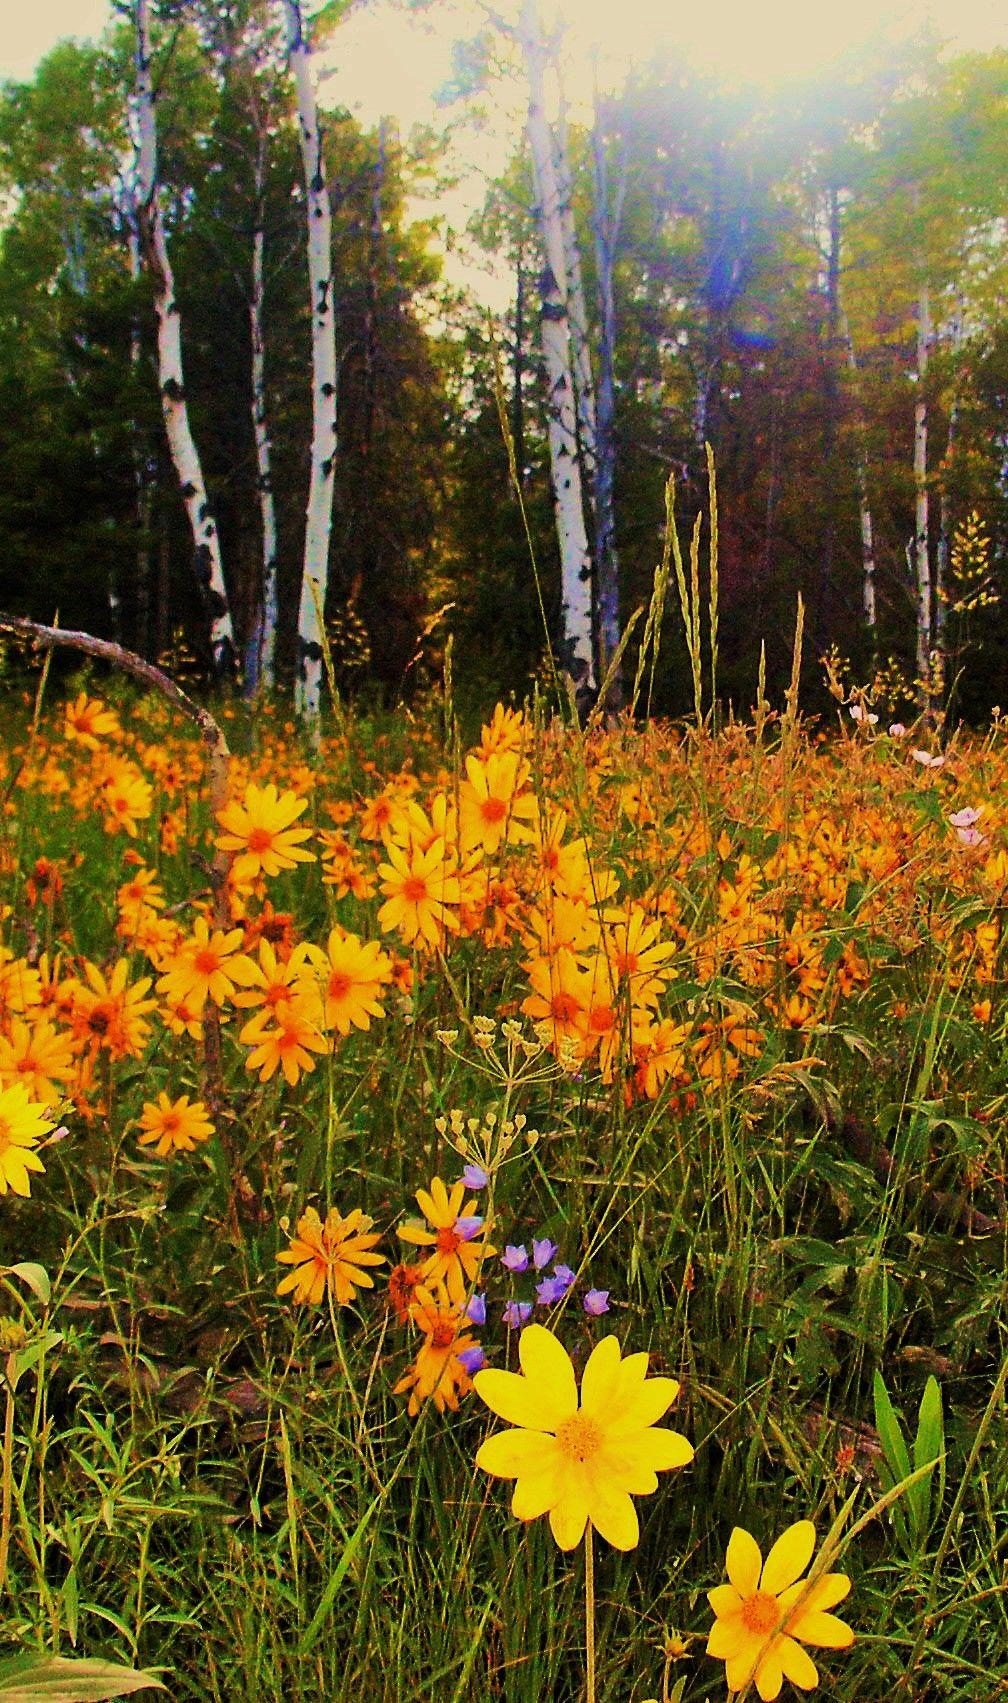 Field of wildflowers near the Grand Tetons. Wild flowers